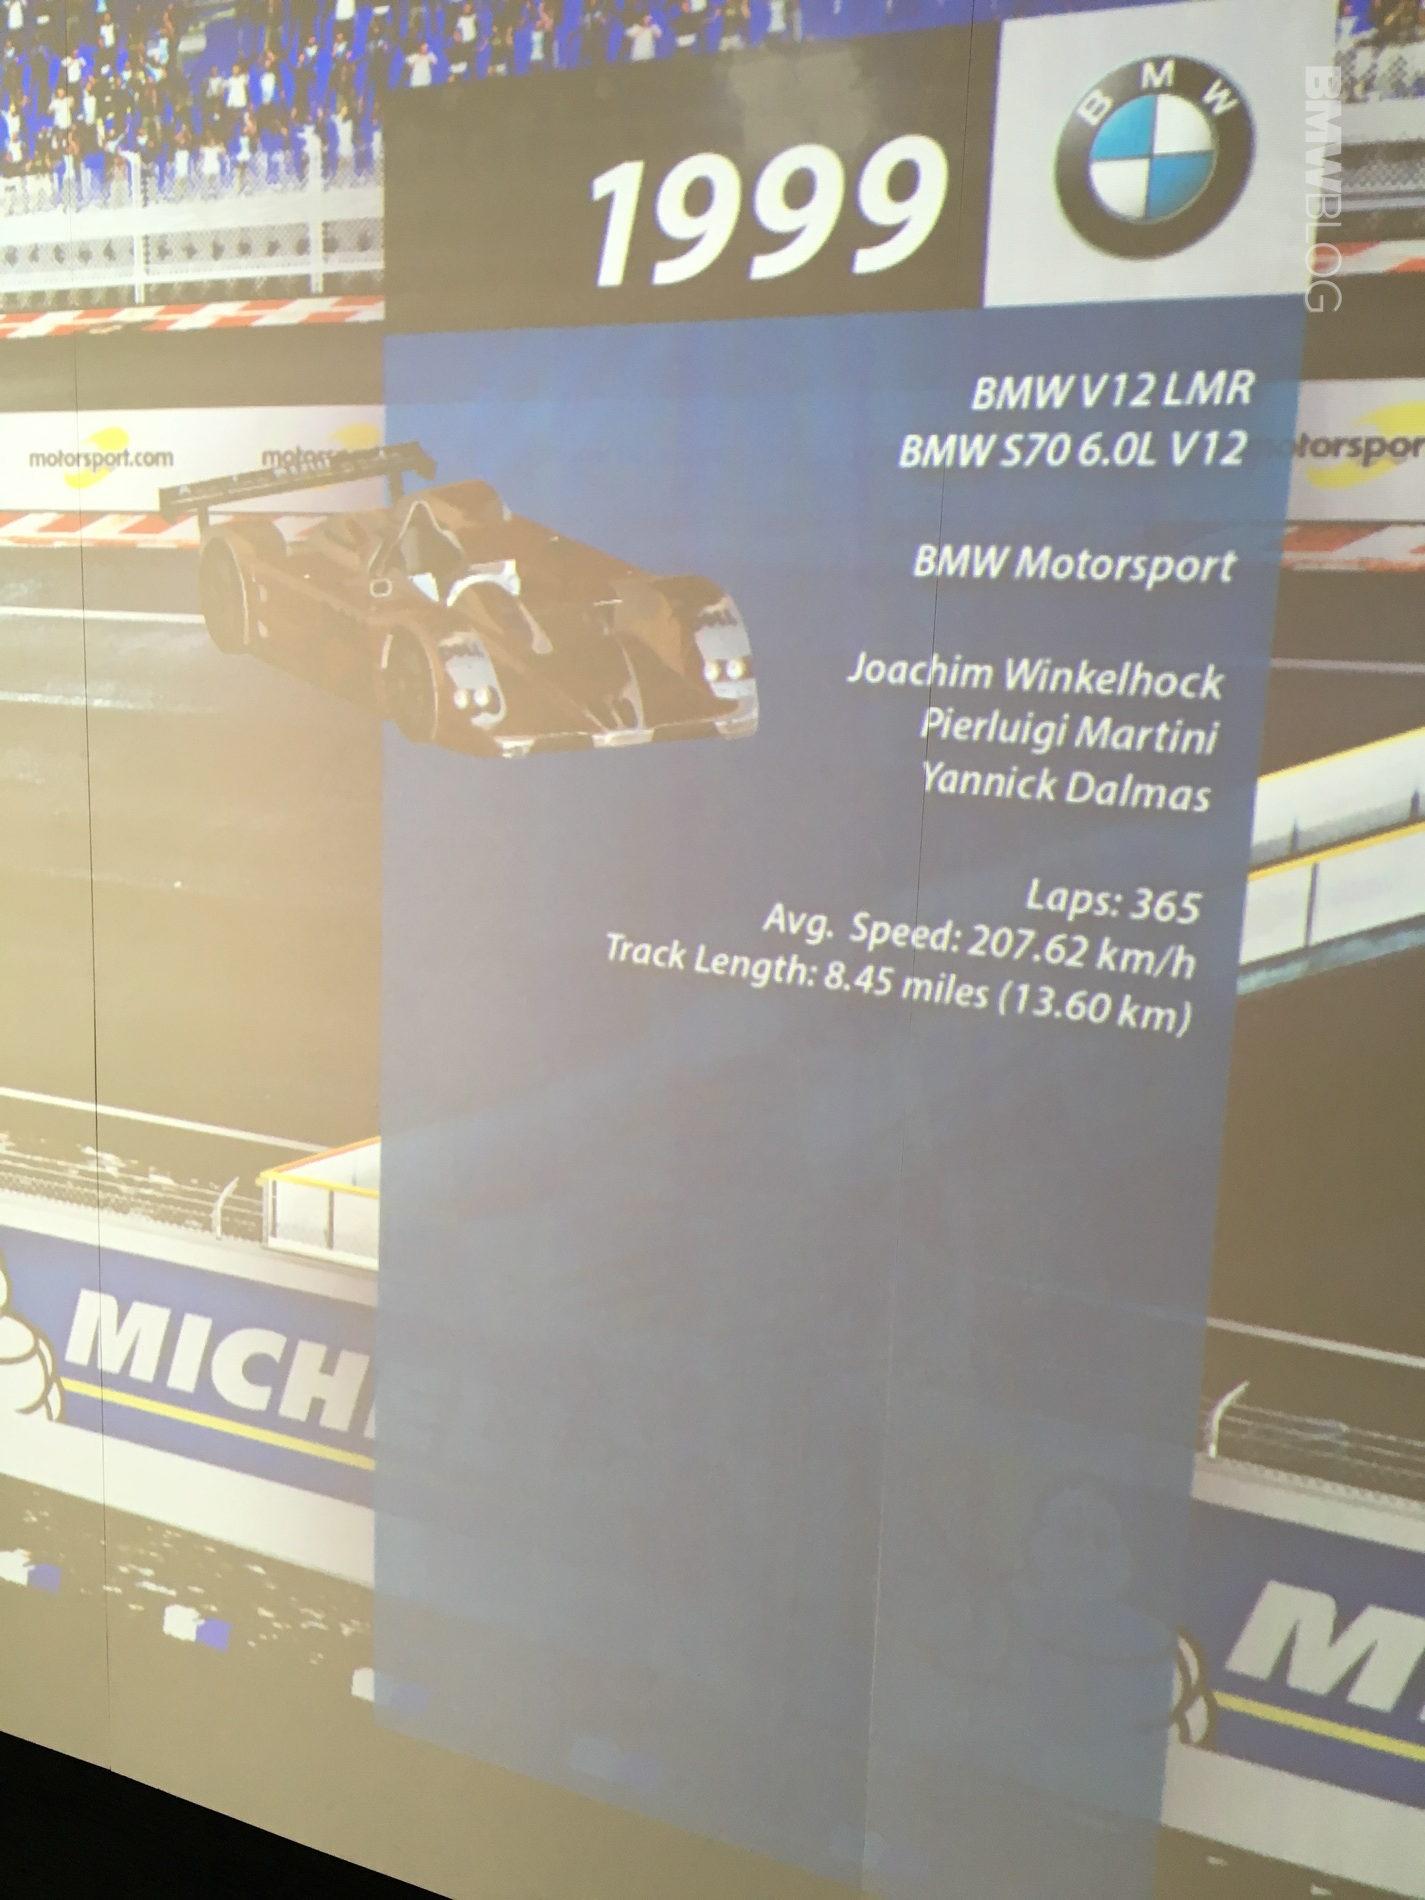 Michelin Digital Display Le Mans 1 e1472011276202